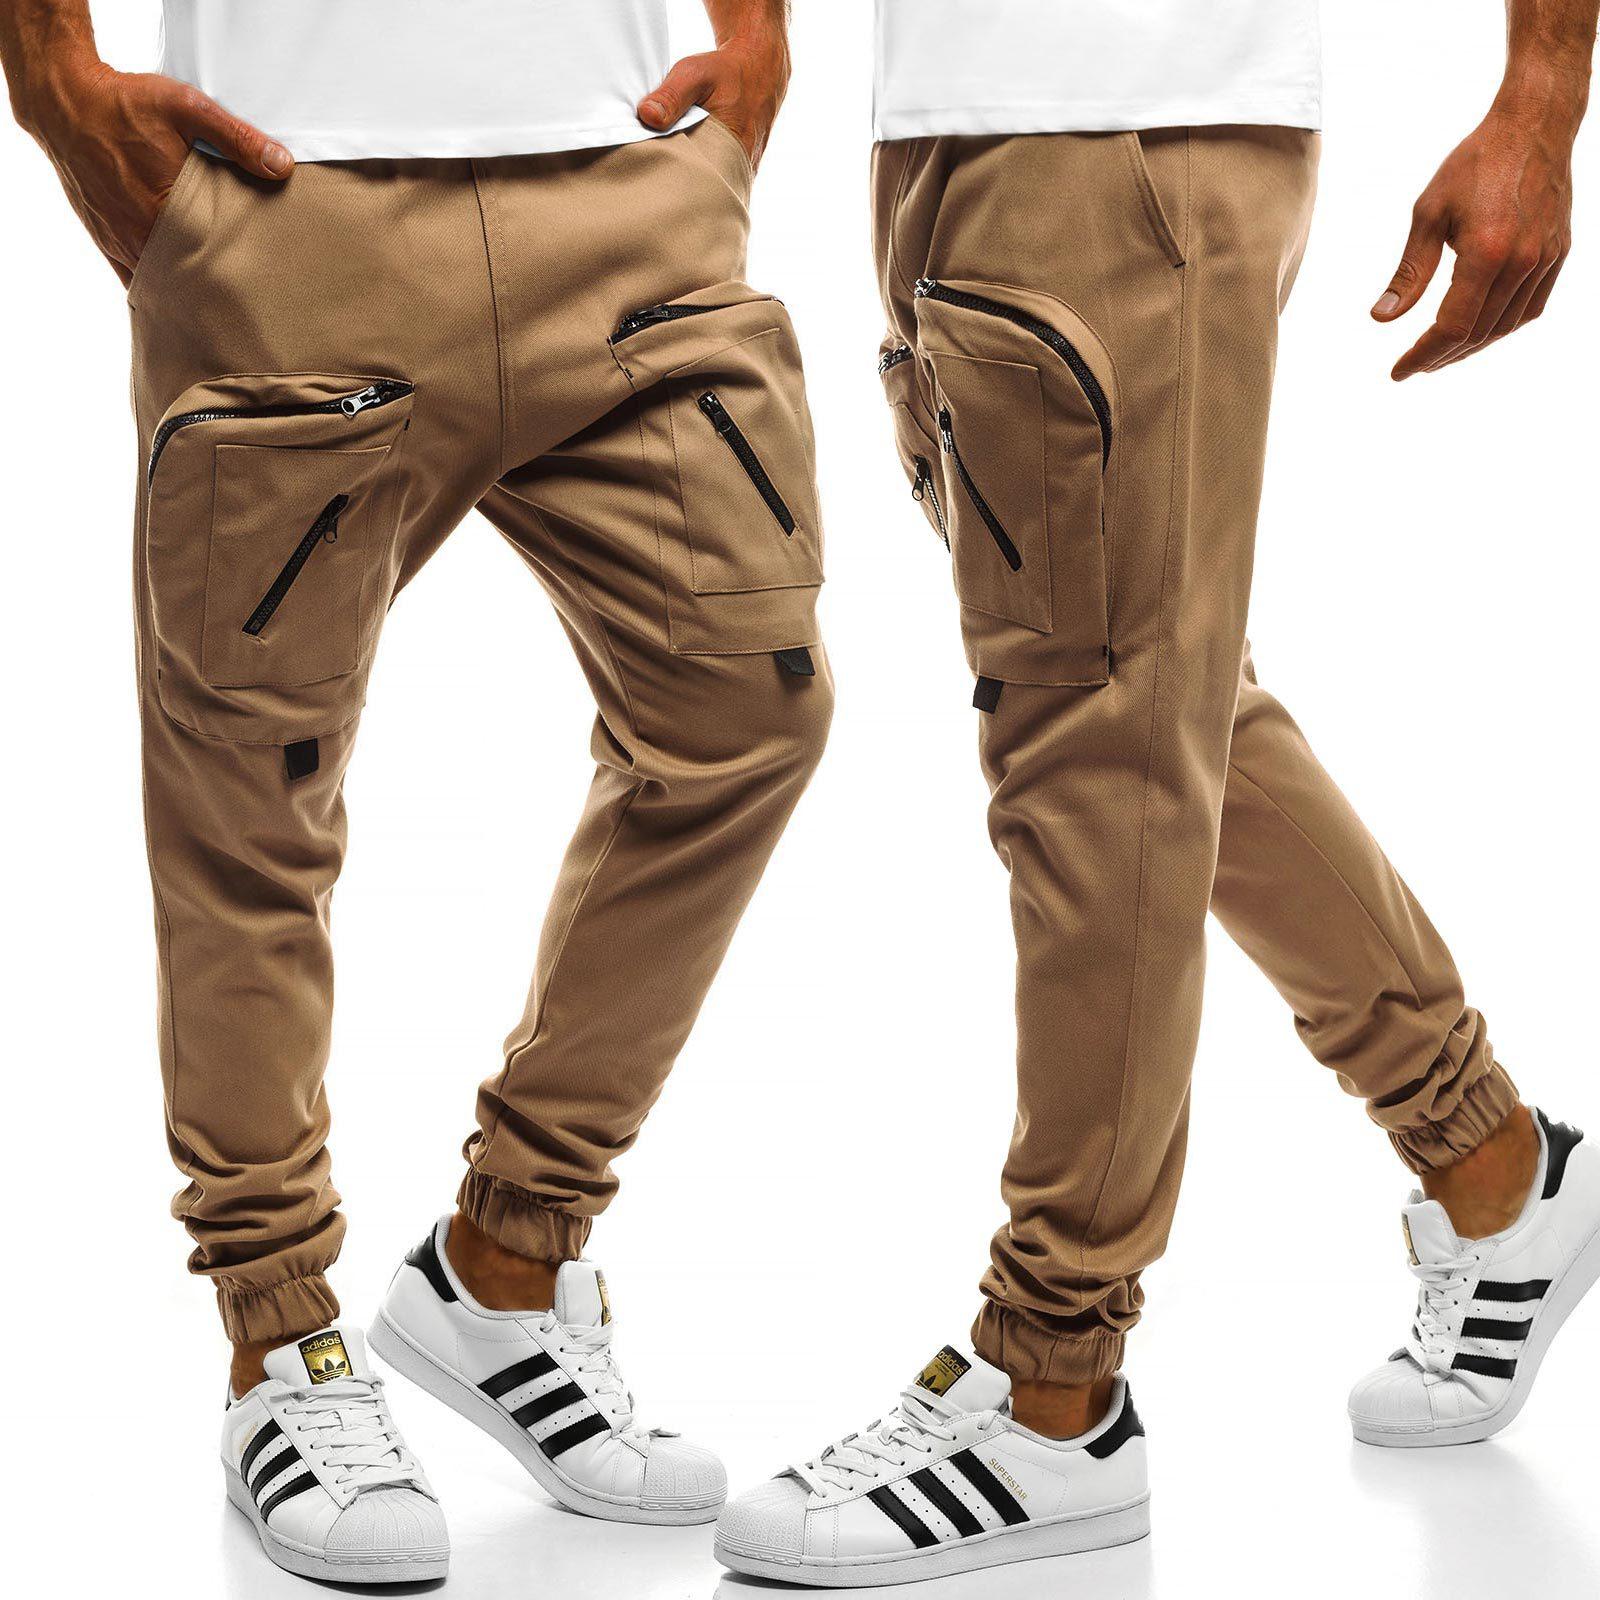 Pants Man New Arrival 2018 Casual Men Pants Cotton Slim Pant Straight Trousers Fashion Business Solid Khaki Black Pants Men